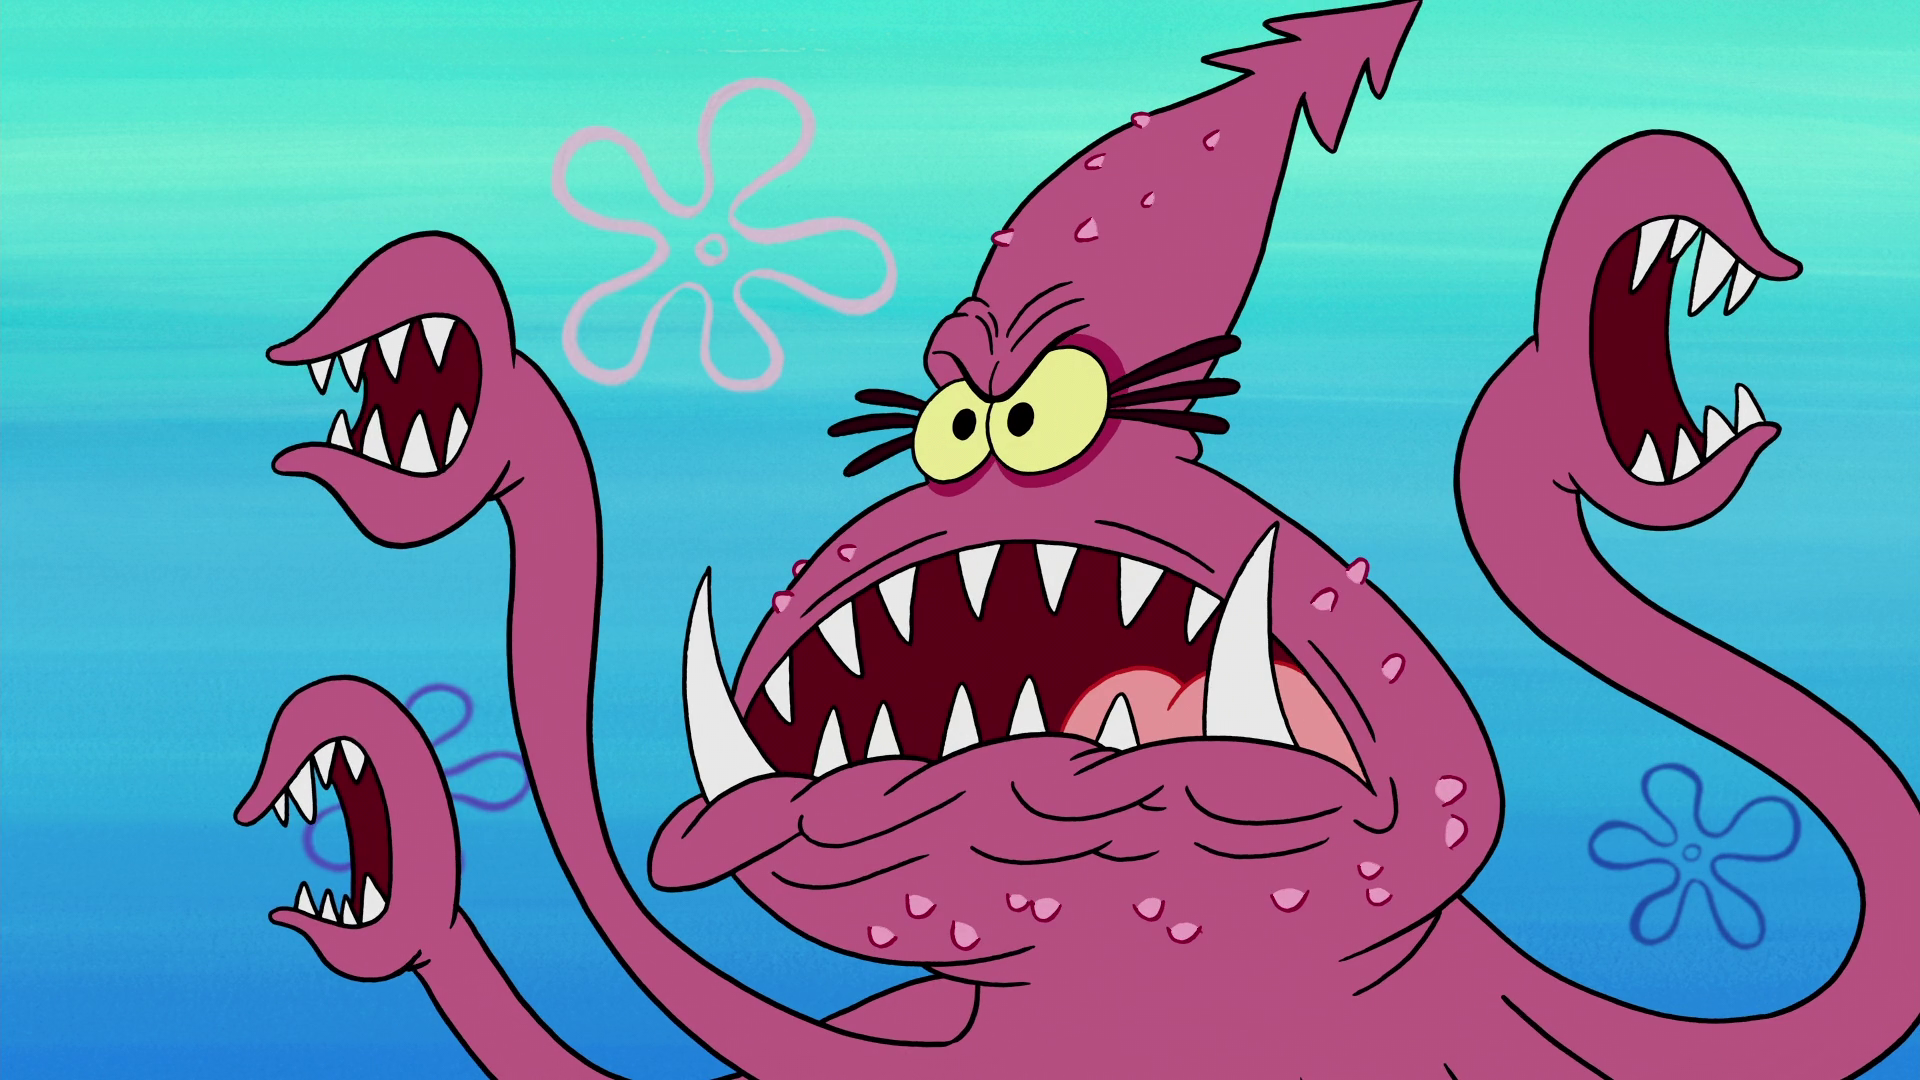 Baby Kraken Monsters From Spongebob Squarepants Wikia Fandom